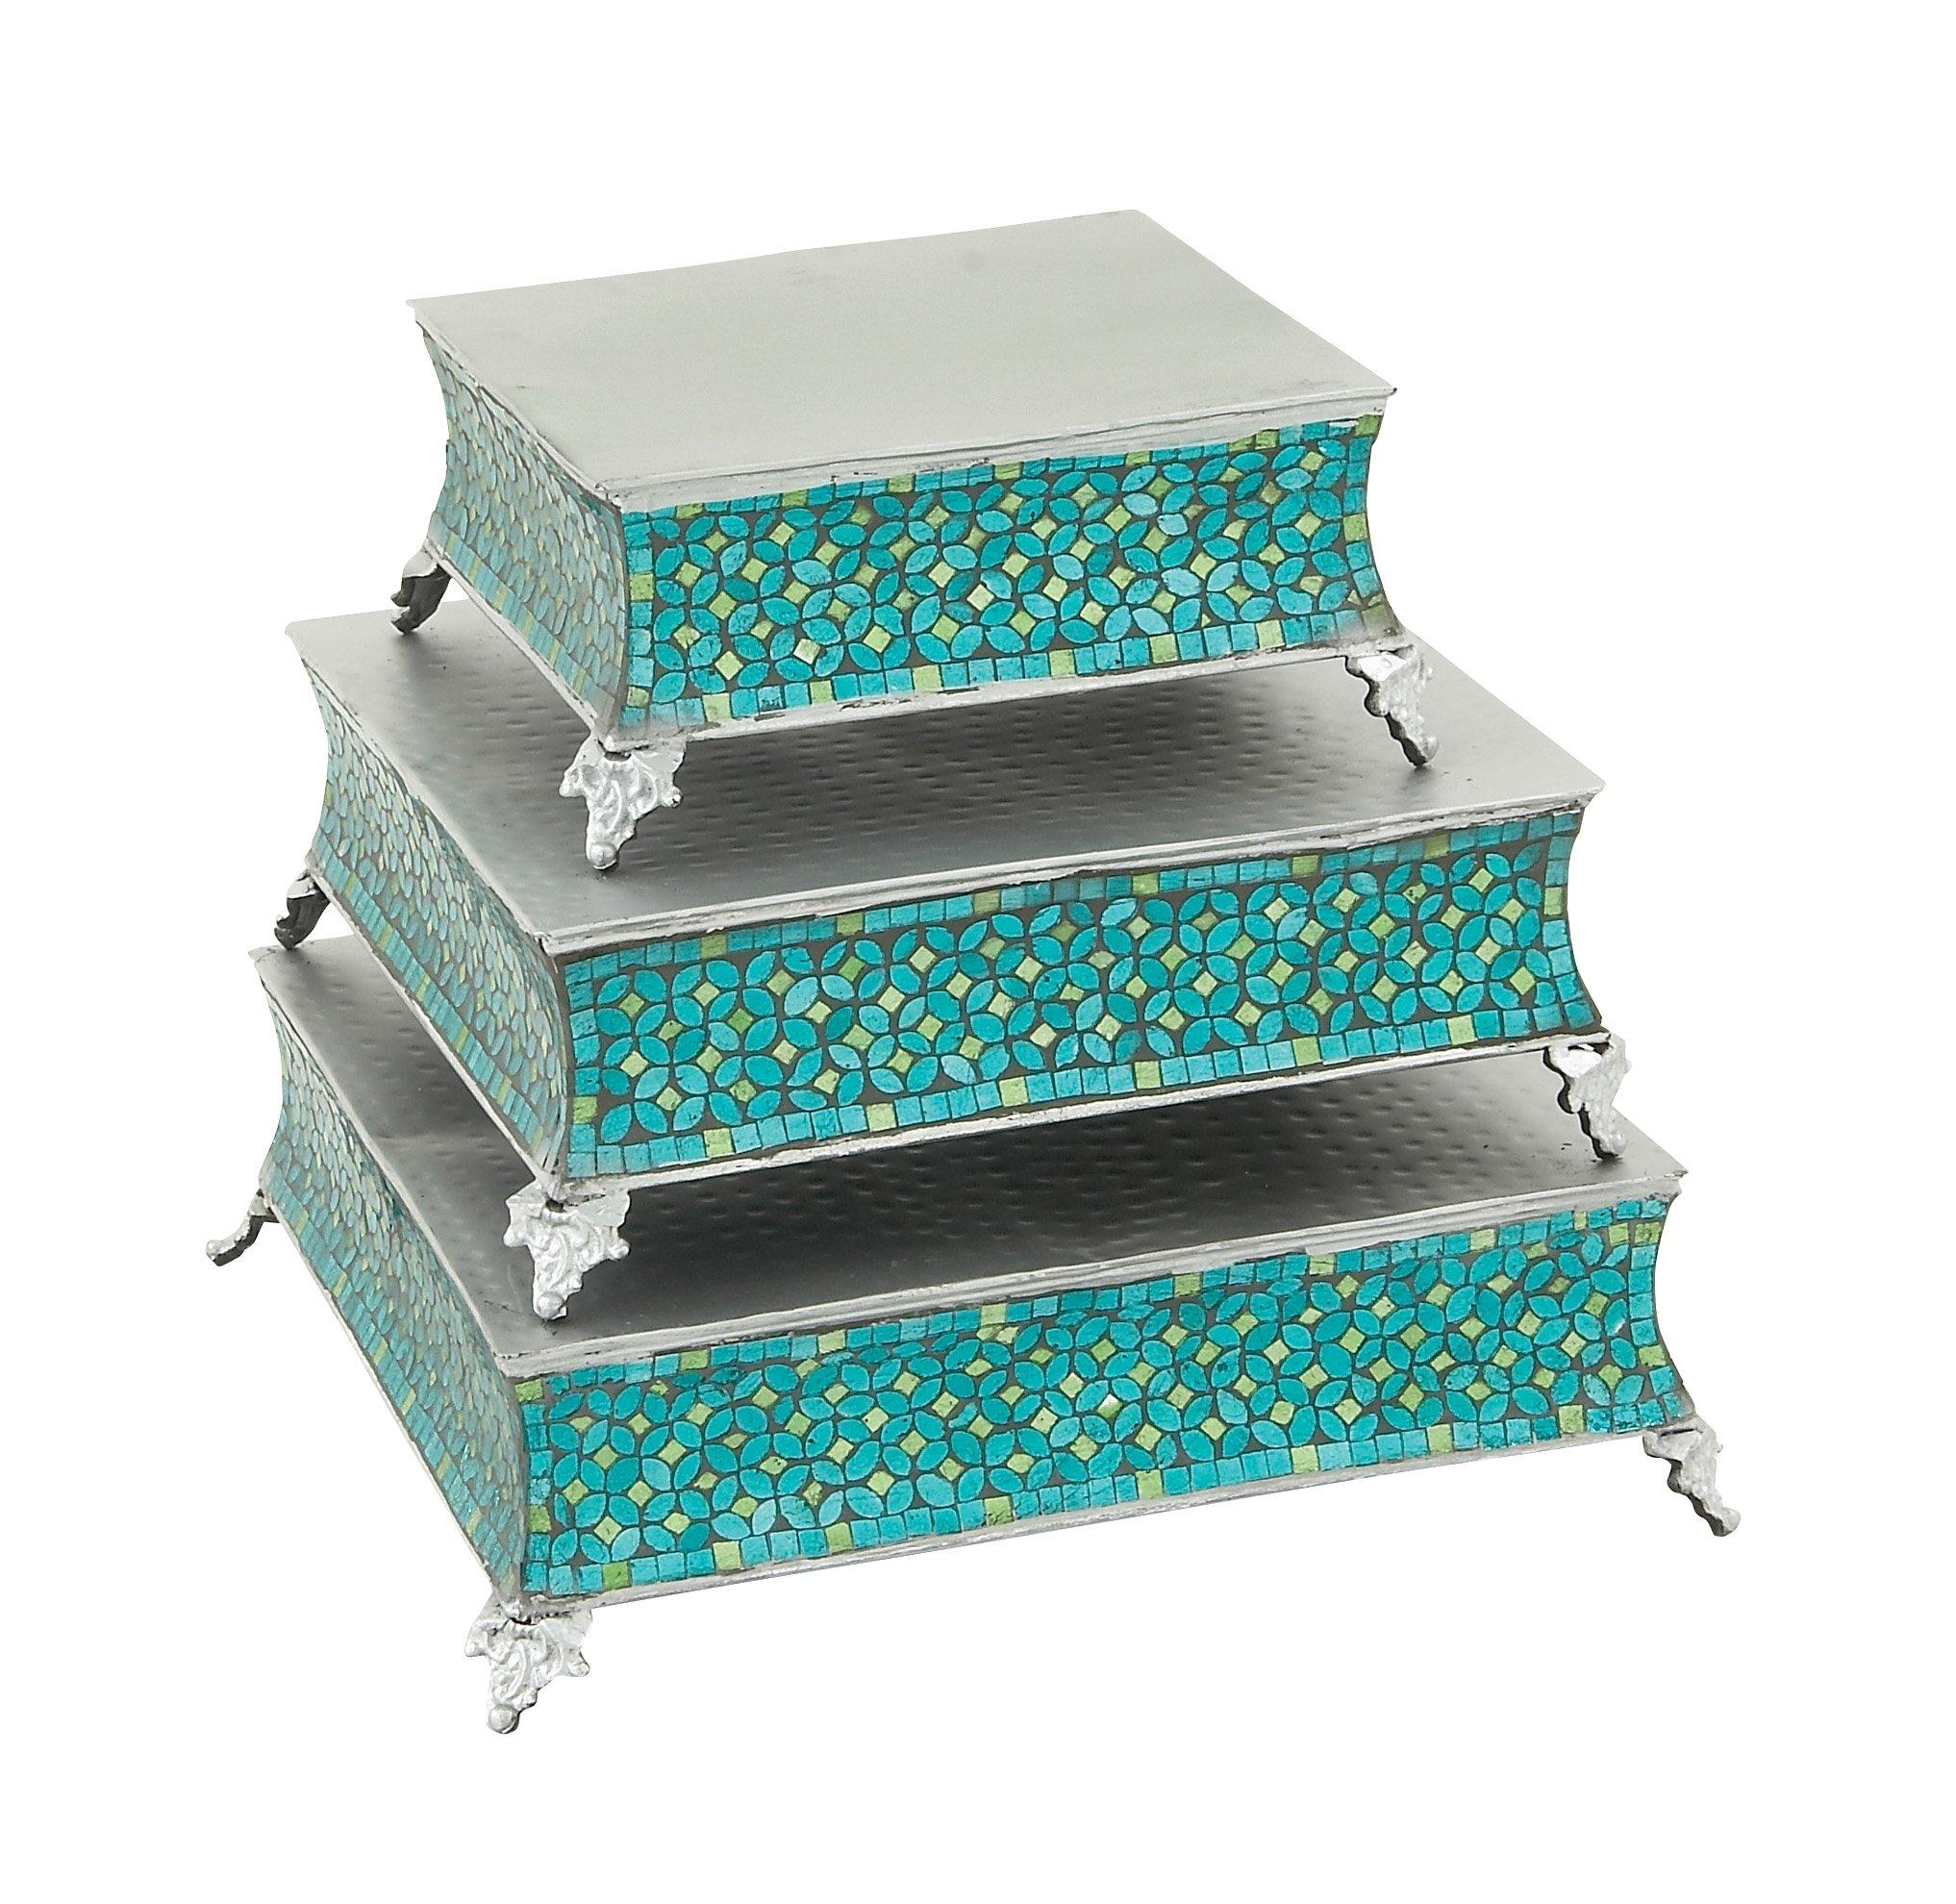 Deco 79 23982 Metal & Mosaic Cake Stand Set of 3